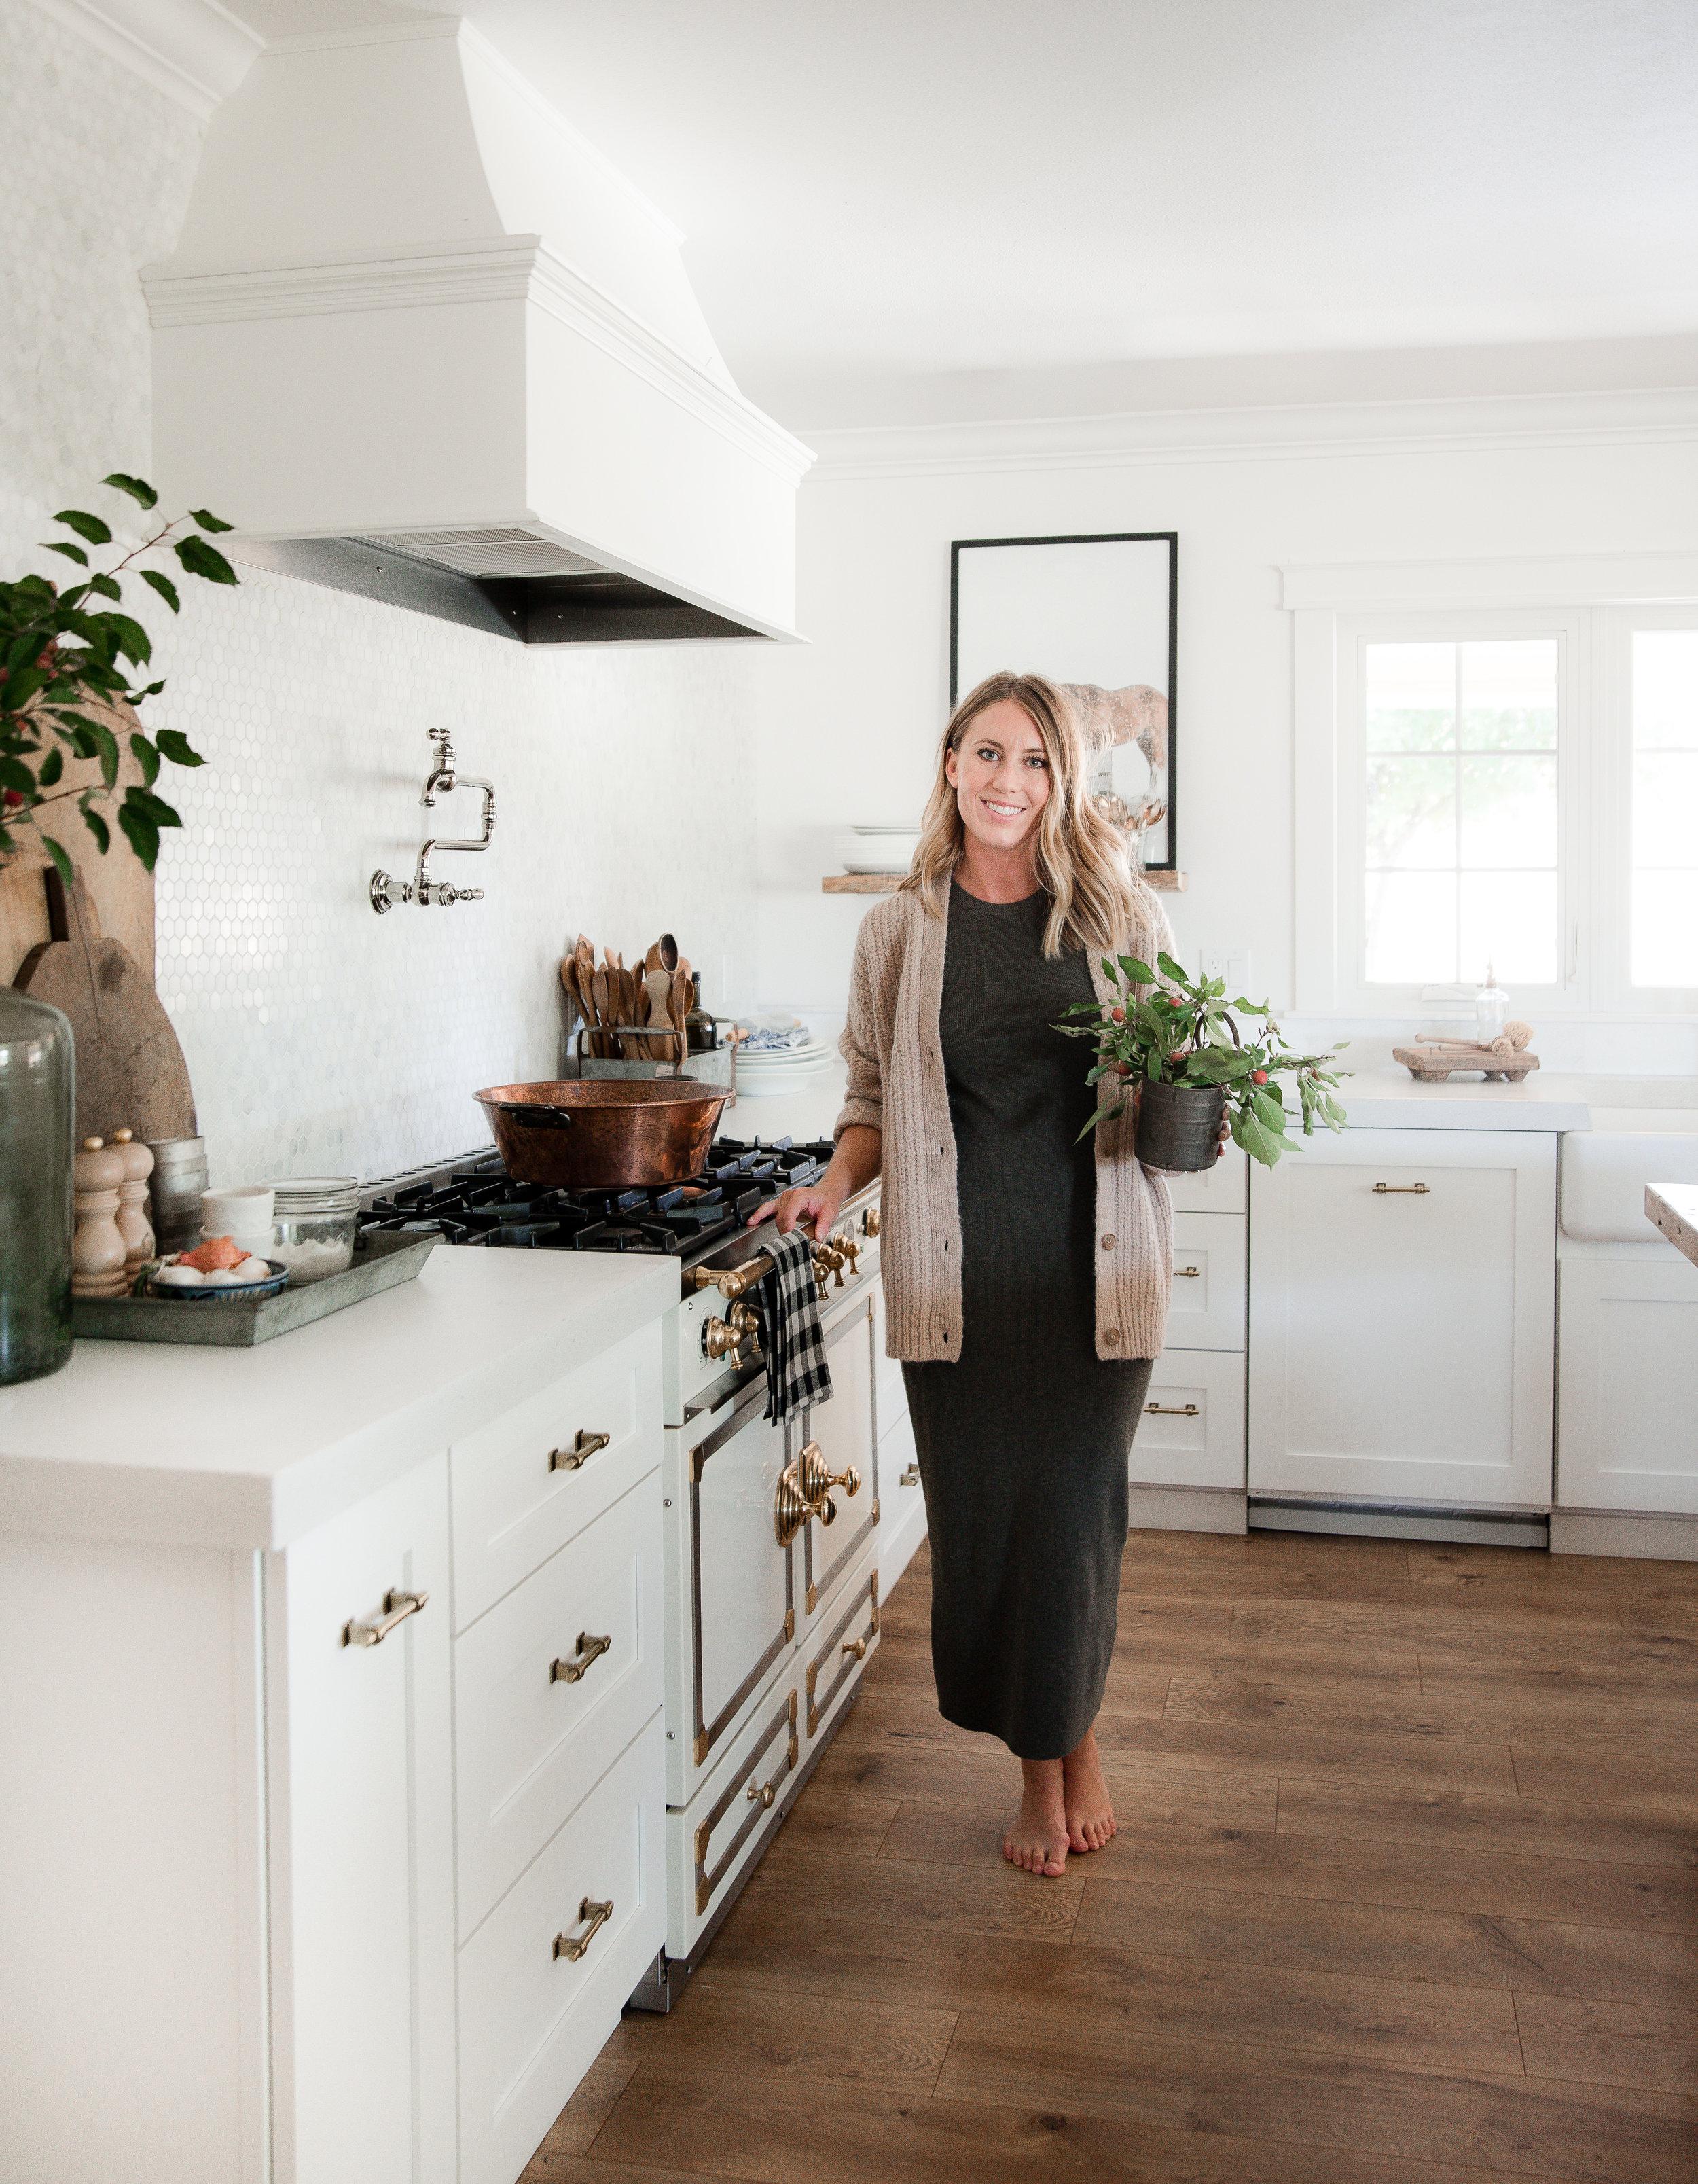 Farmhouse kitchen design by Chloe of Boxwood Avenue #modernfarmhousekitchen #modernfarmhouse #whitekitchen